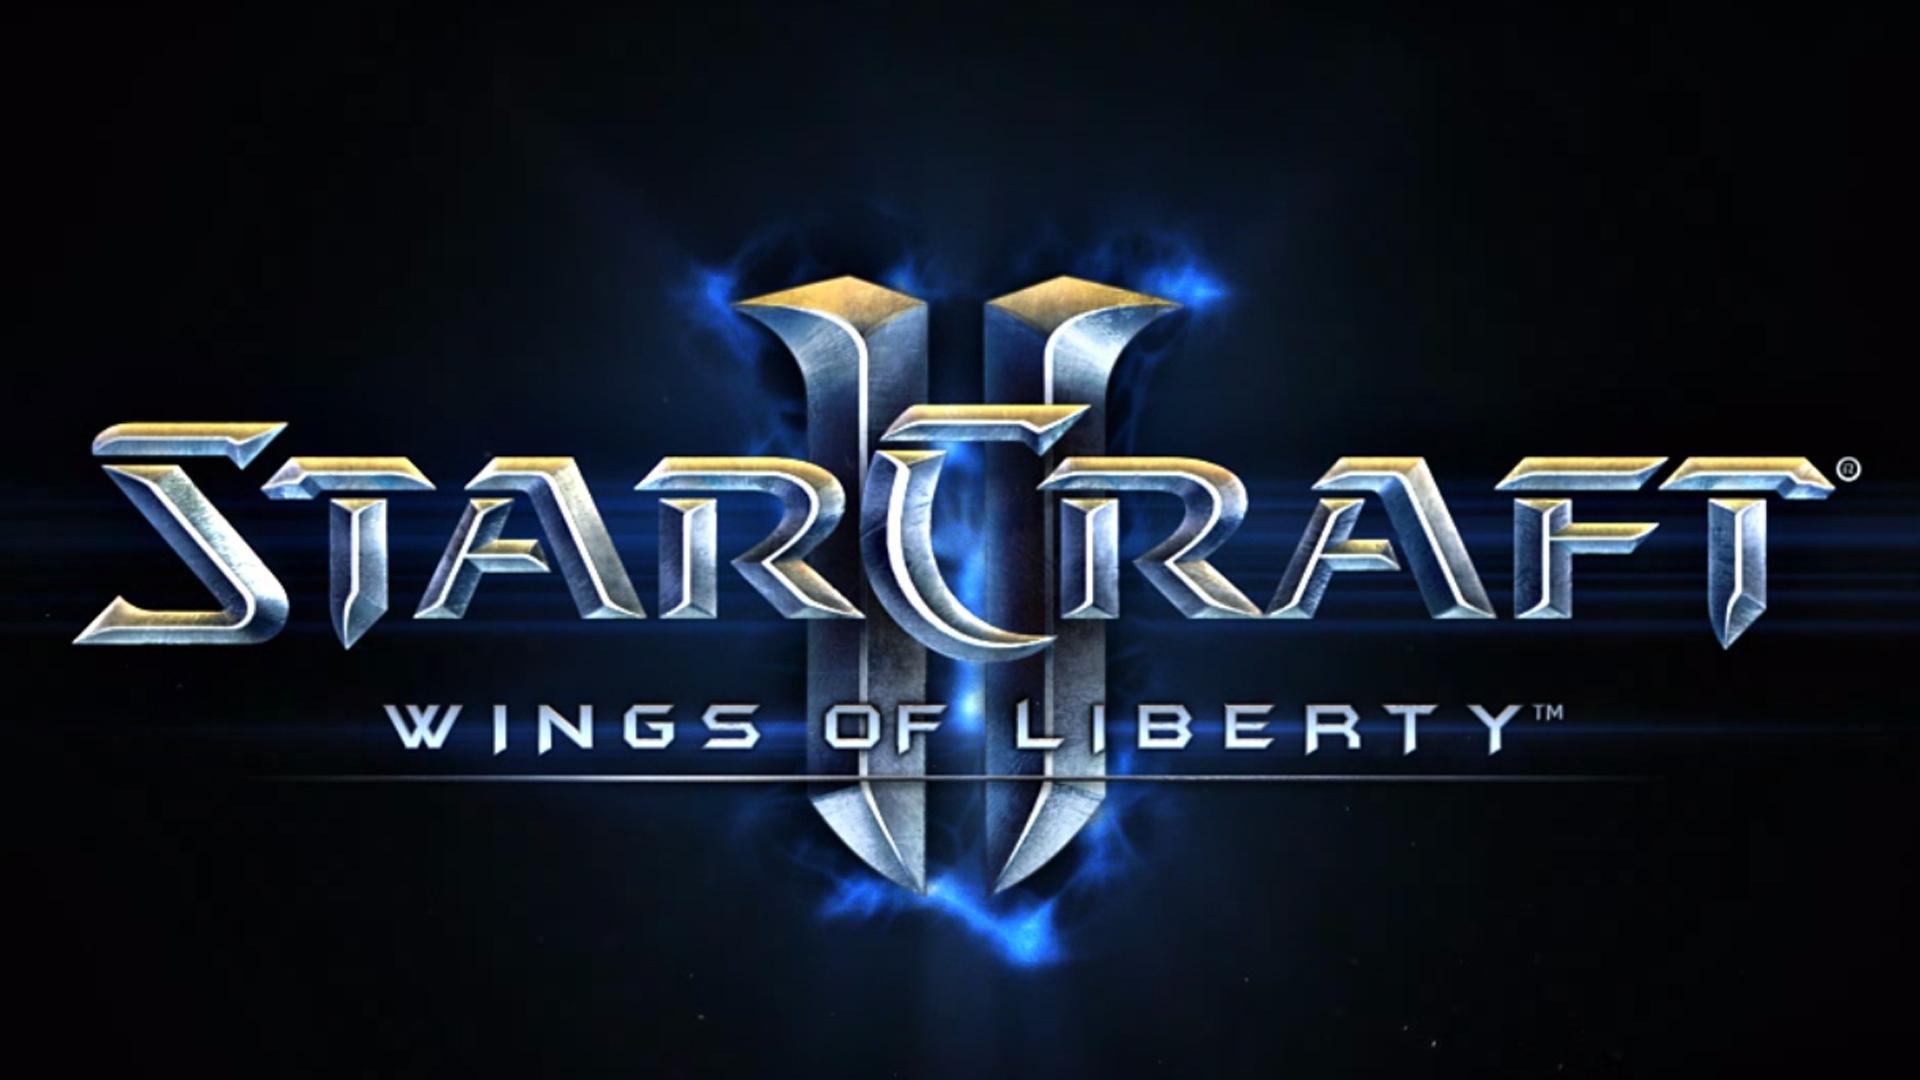 Starcraft Logo Wallpaper 41553 1920x1200 px